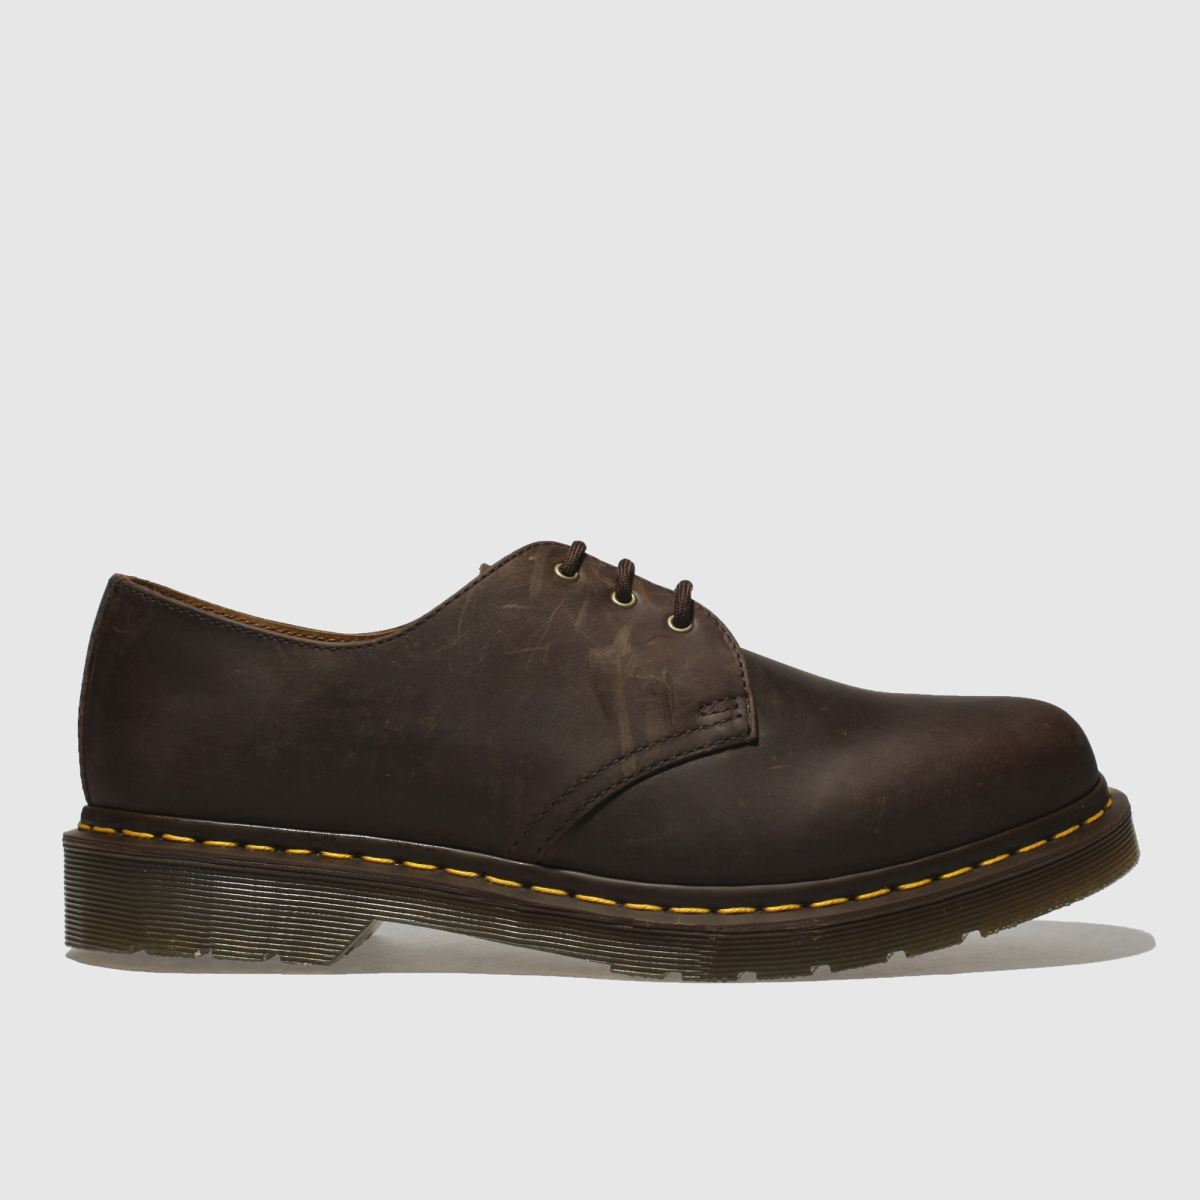 Dr Martens Brown 1461 Crazyhorse Shoes